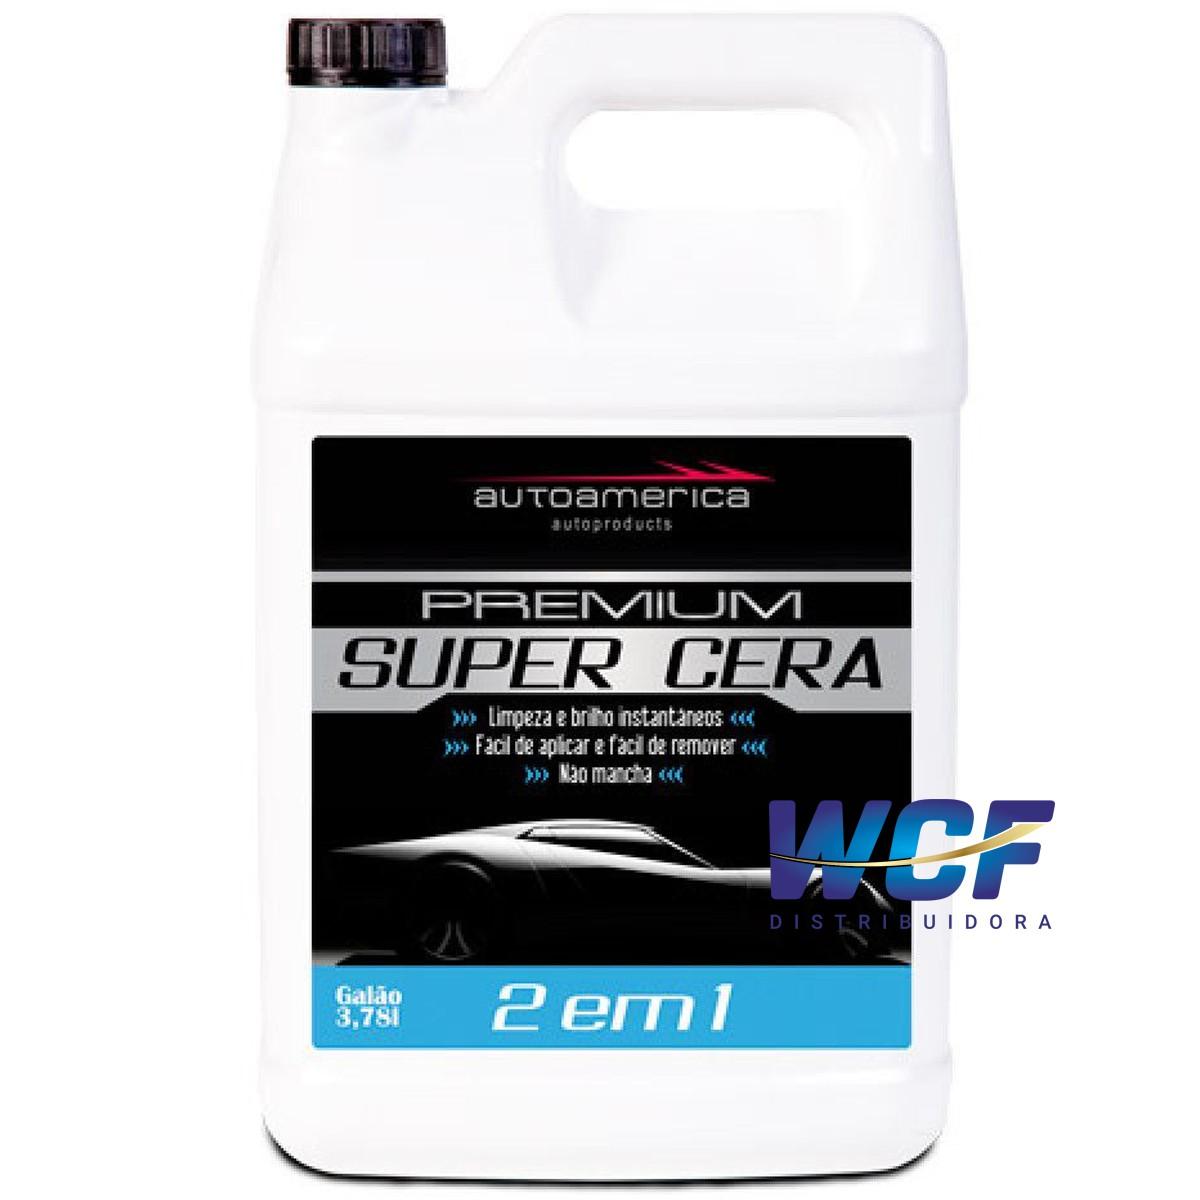 AUTOAMERICA SUPER CERA 3.78 LT